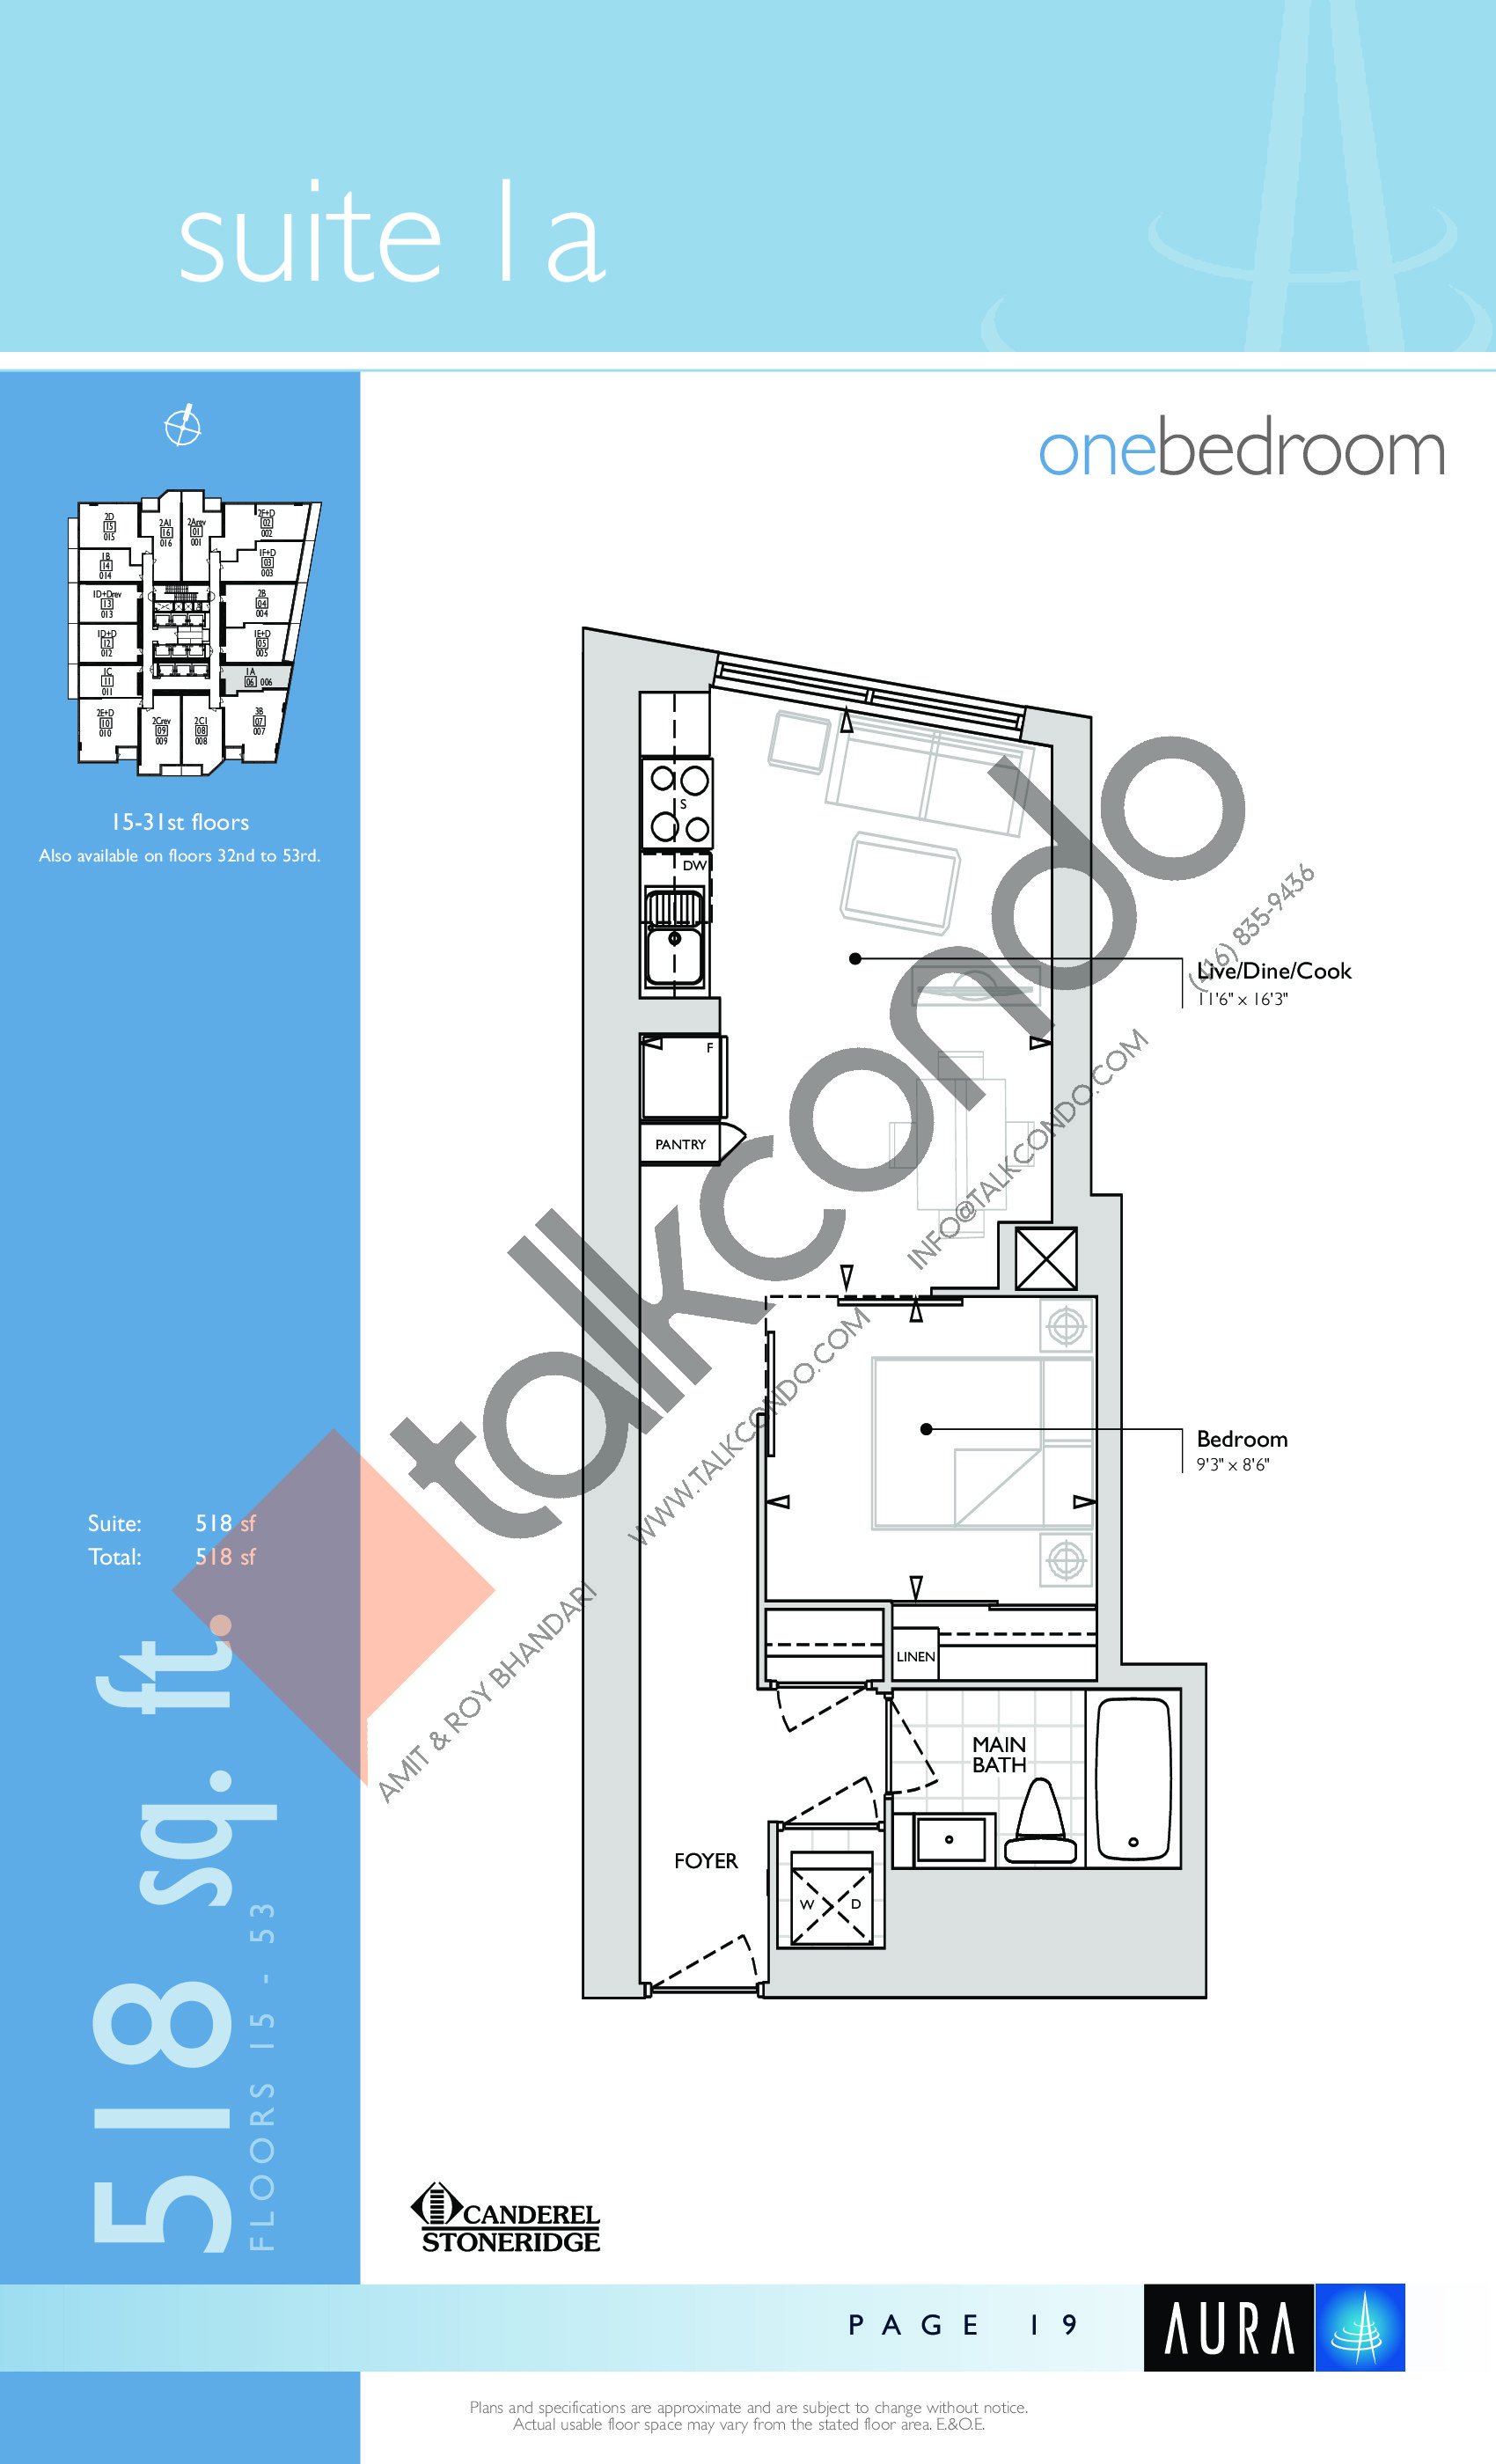 Aura At College Park Condos Floor Plans Prices Availability Talkcondo